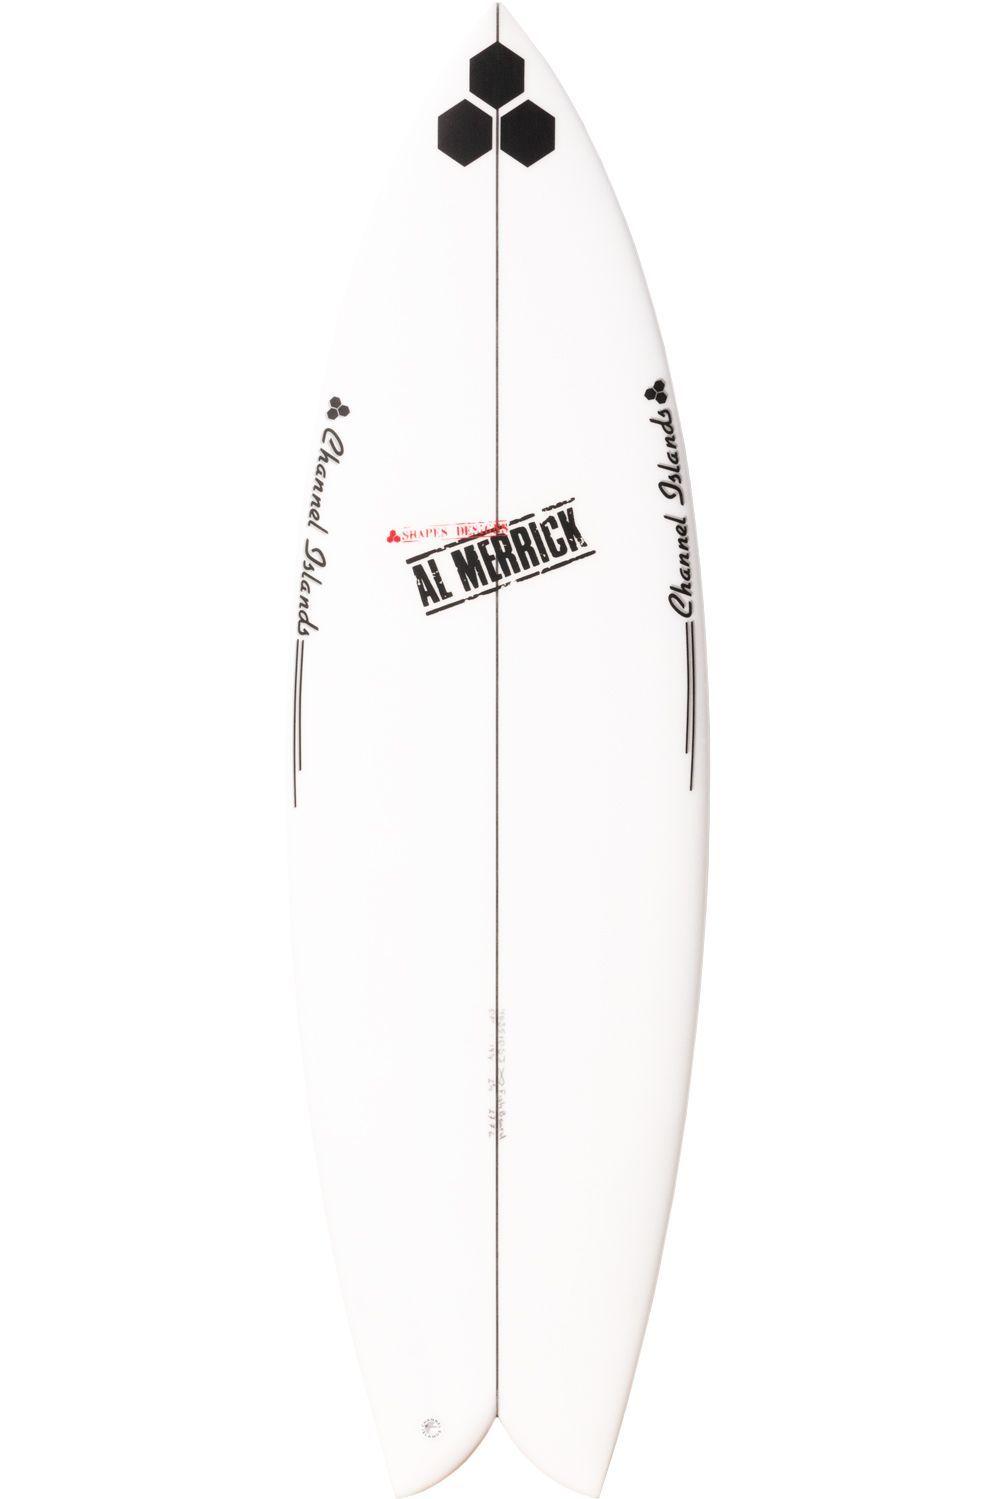 Prancha Surf Al Merrick FISHBEARD 5'10 Fish Tail - White Futures Twin 5ft10